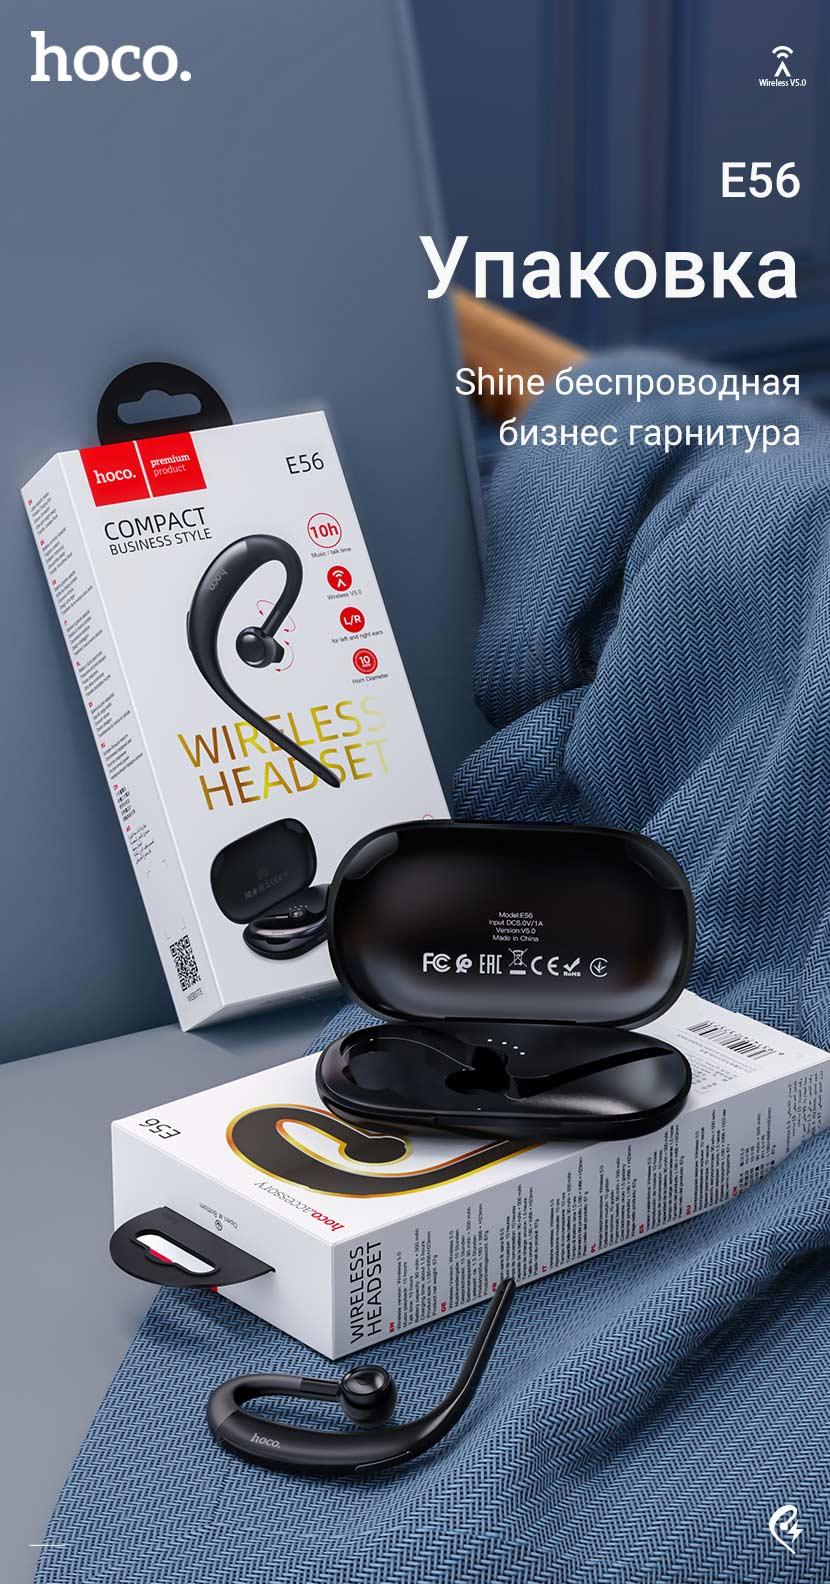 hoco news e56 shine business wireless headset package ru